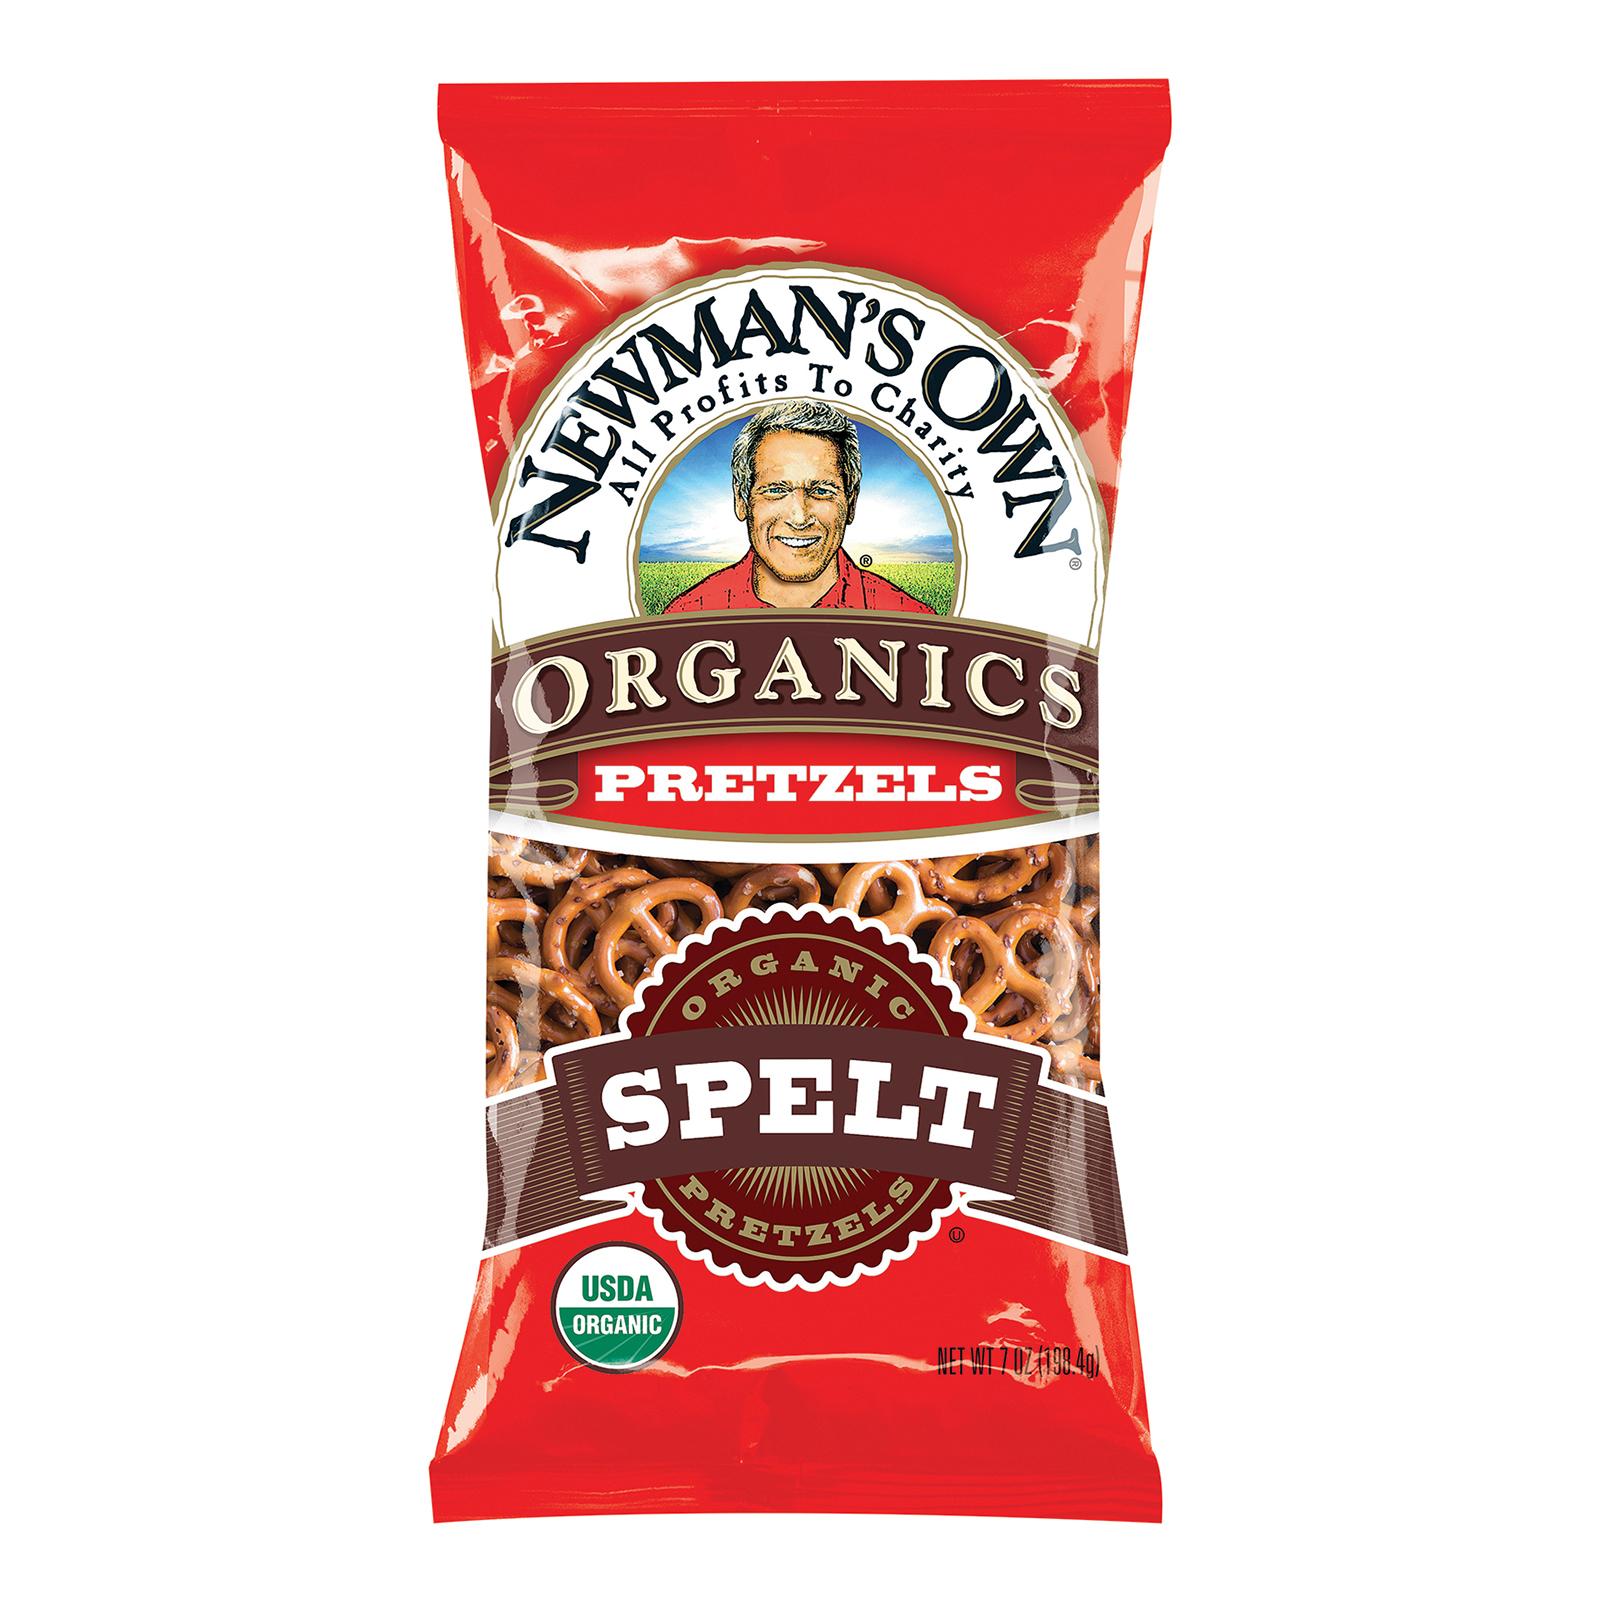 Newman's Own Organics Spelt Pretzels - Case of 12 - 7 oz.